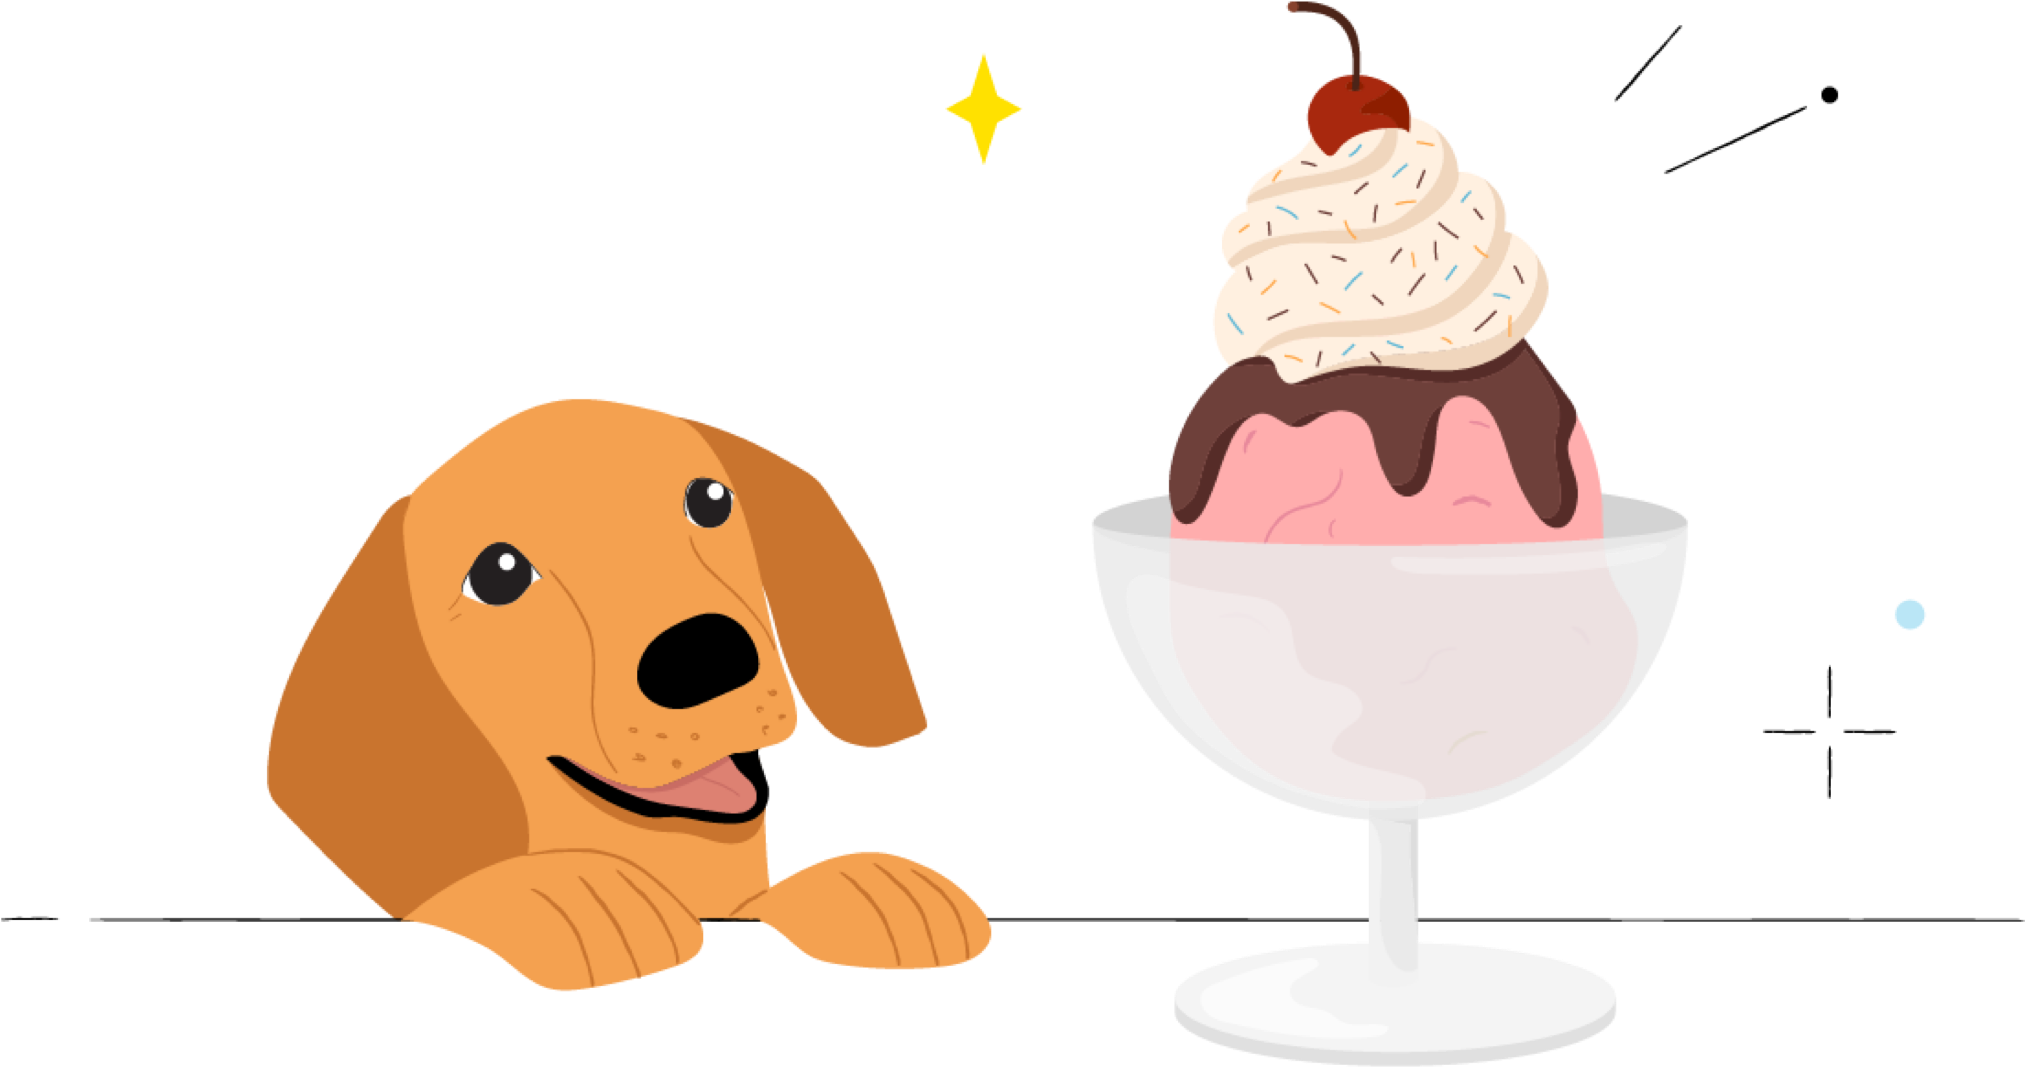 A cute dog looking at ice cream sundae